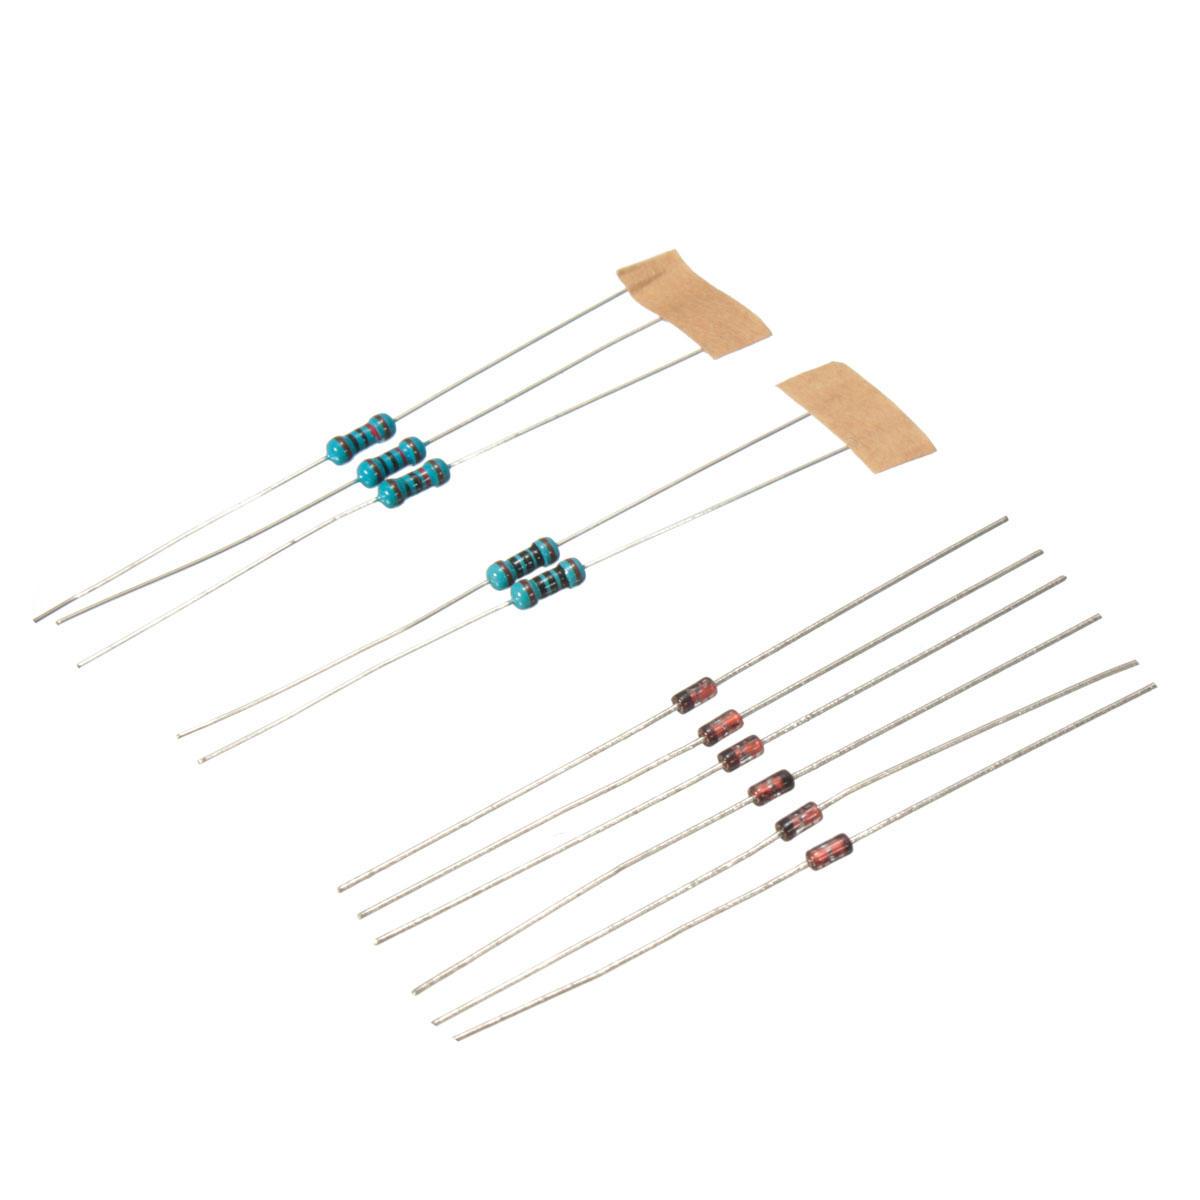 diy circuit board kits